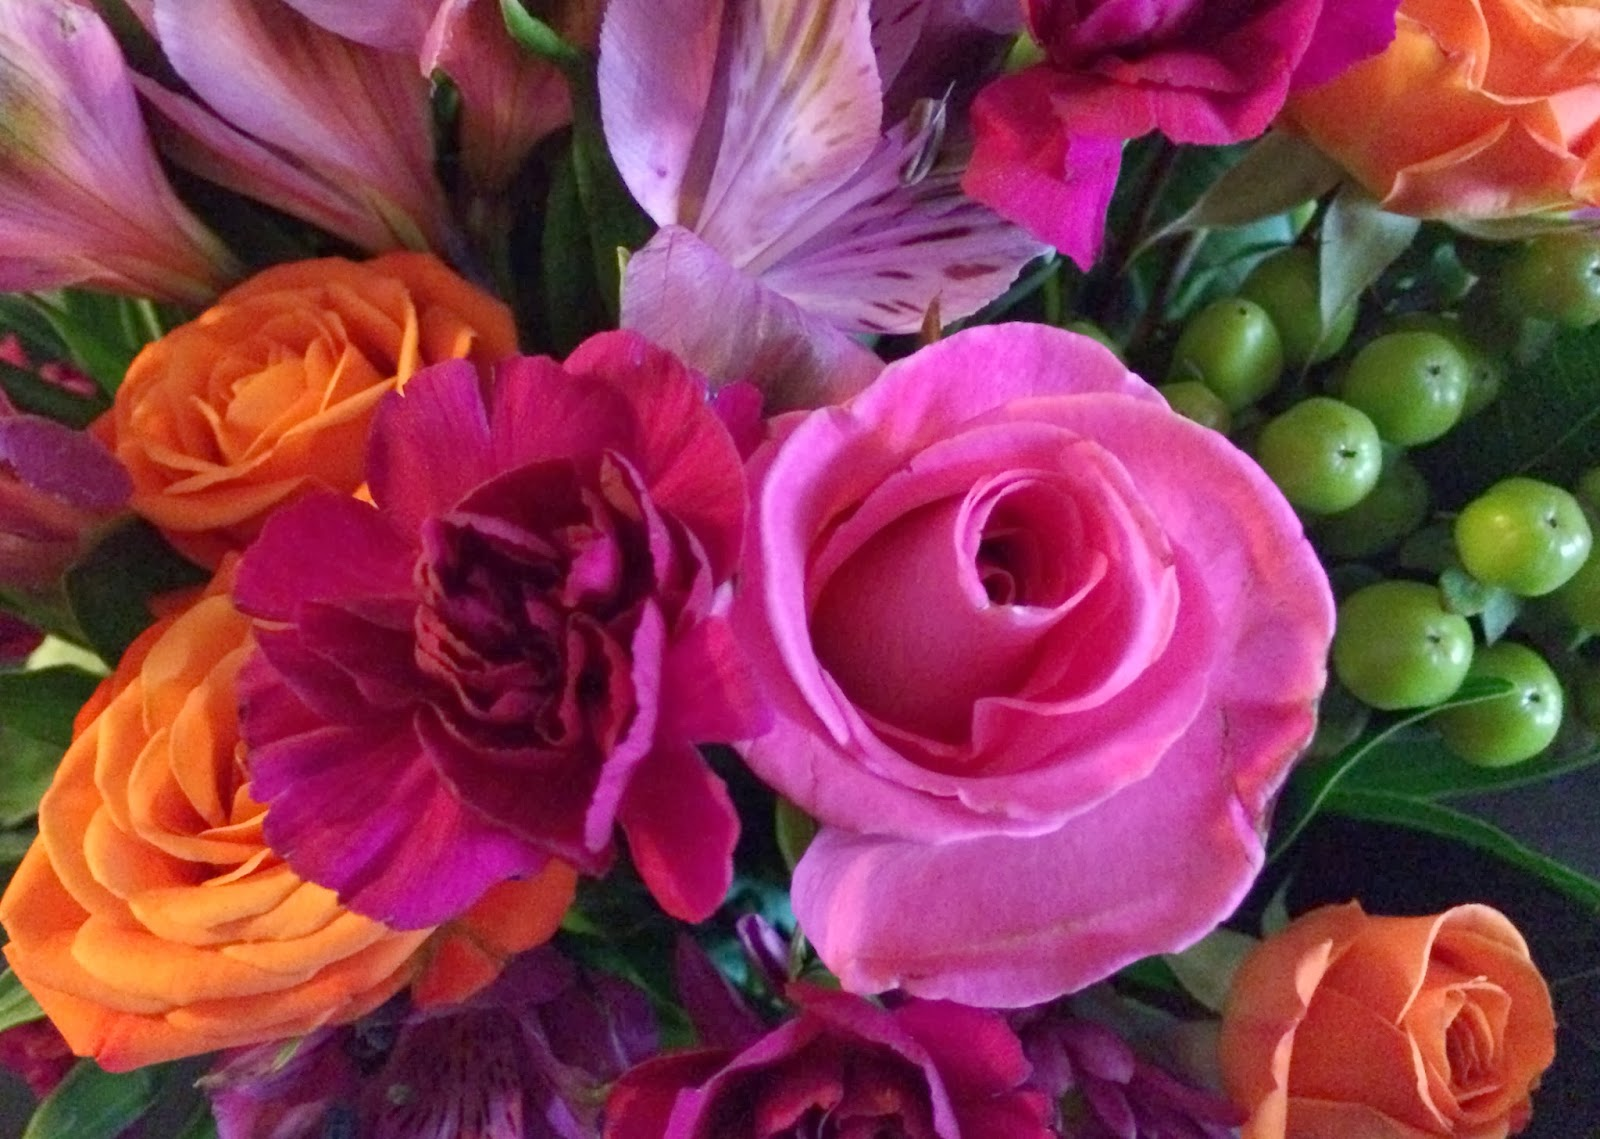 Delight & Decorum Fresh Cut Flowers